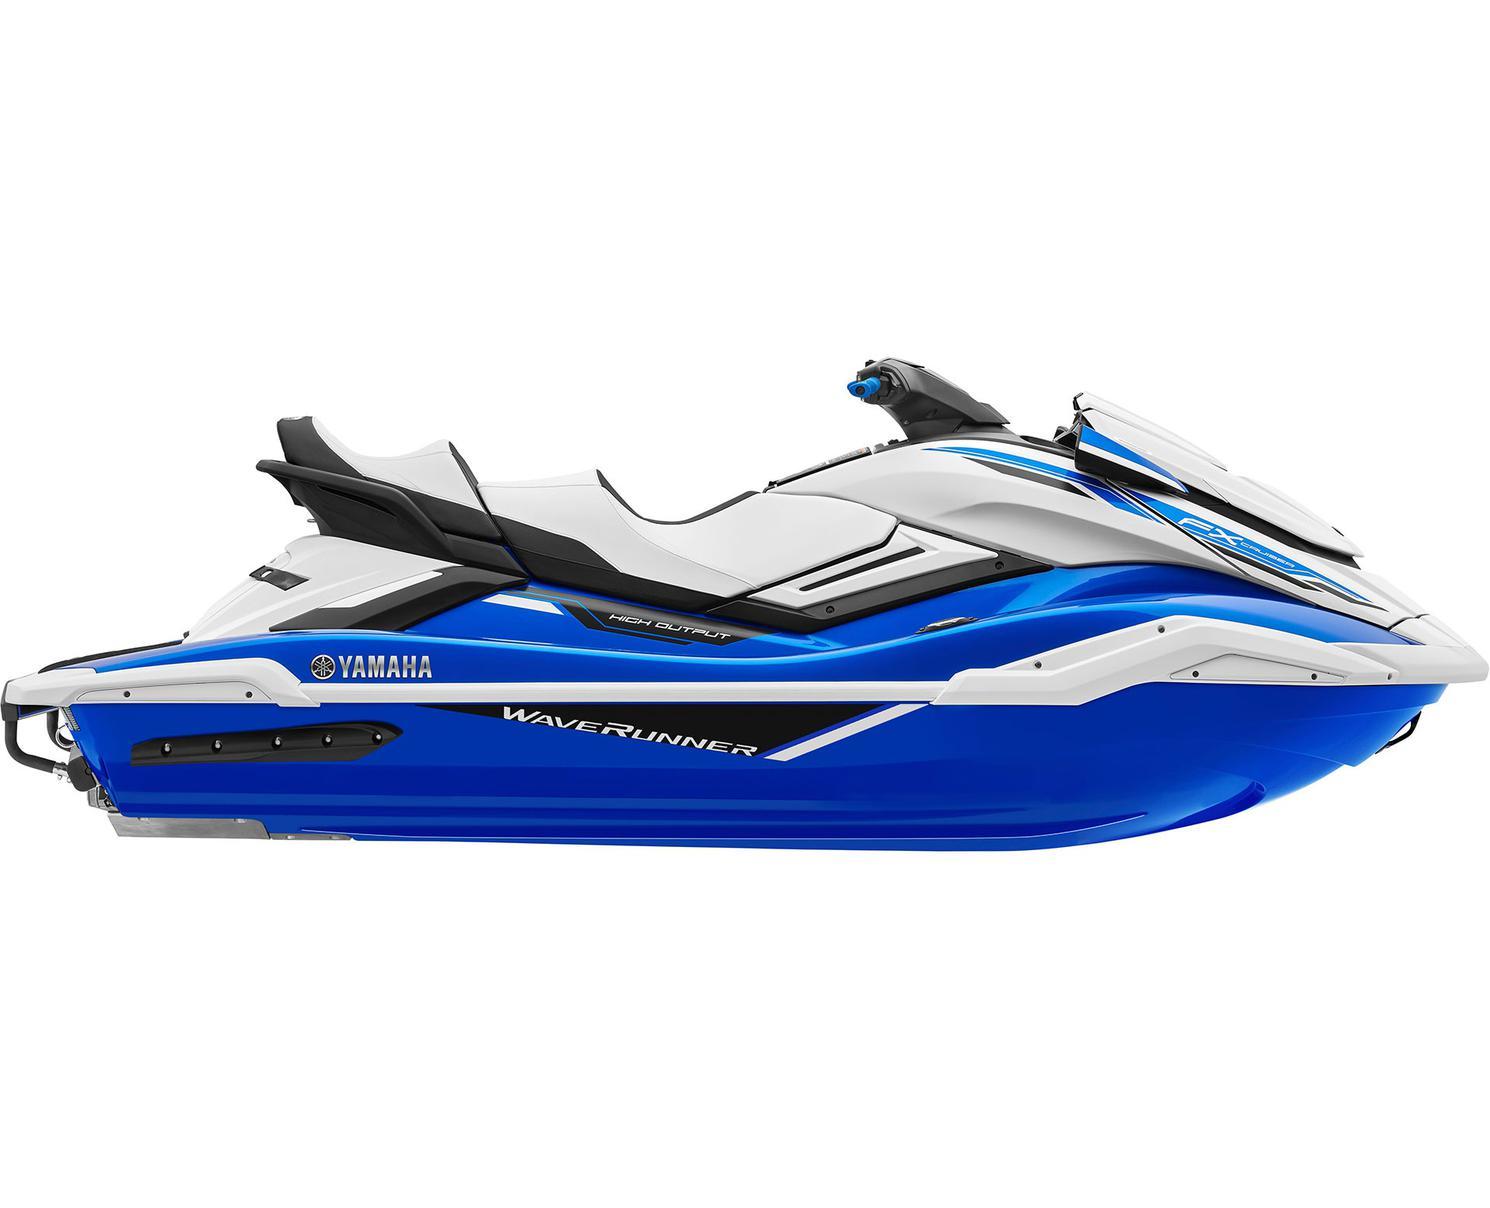 Yamaha FX CRUISER HO Bleu Azur/Blanc 2021